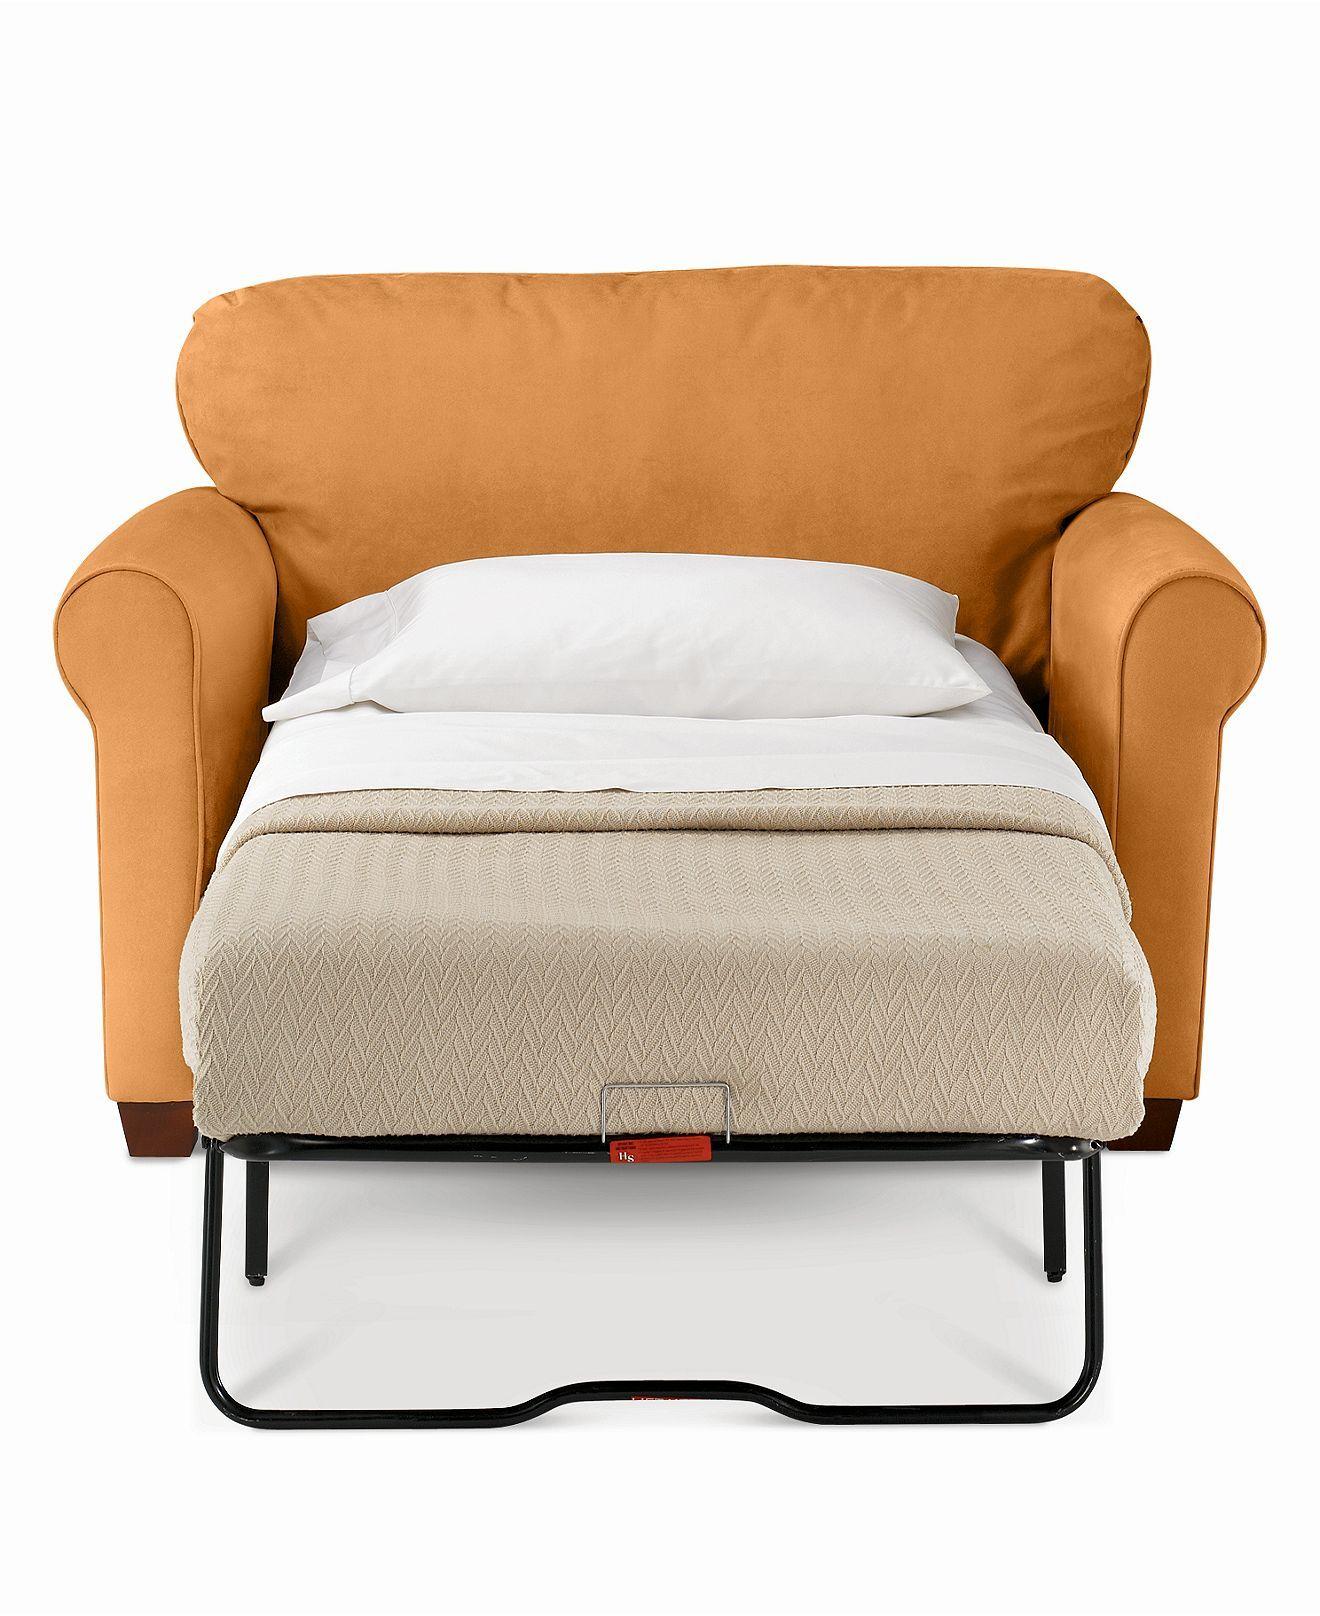 Sasha Sofa Bed, Twin Sleeper furniture Macy's